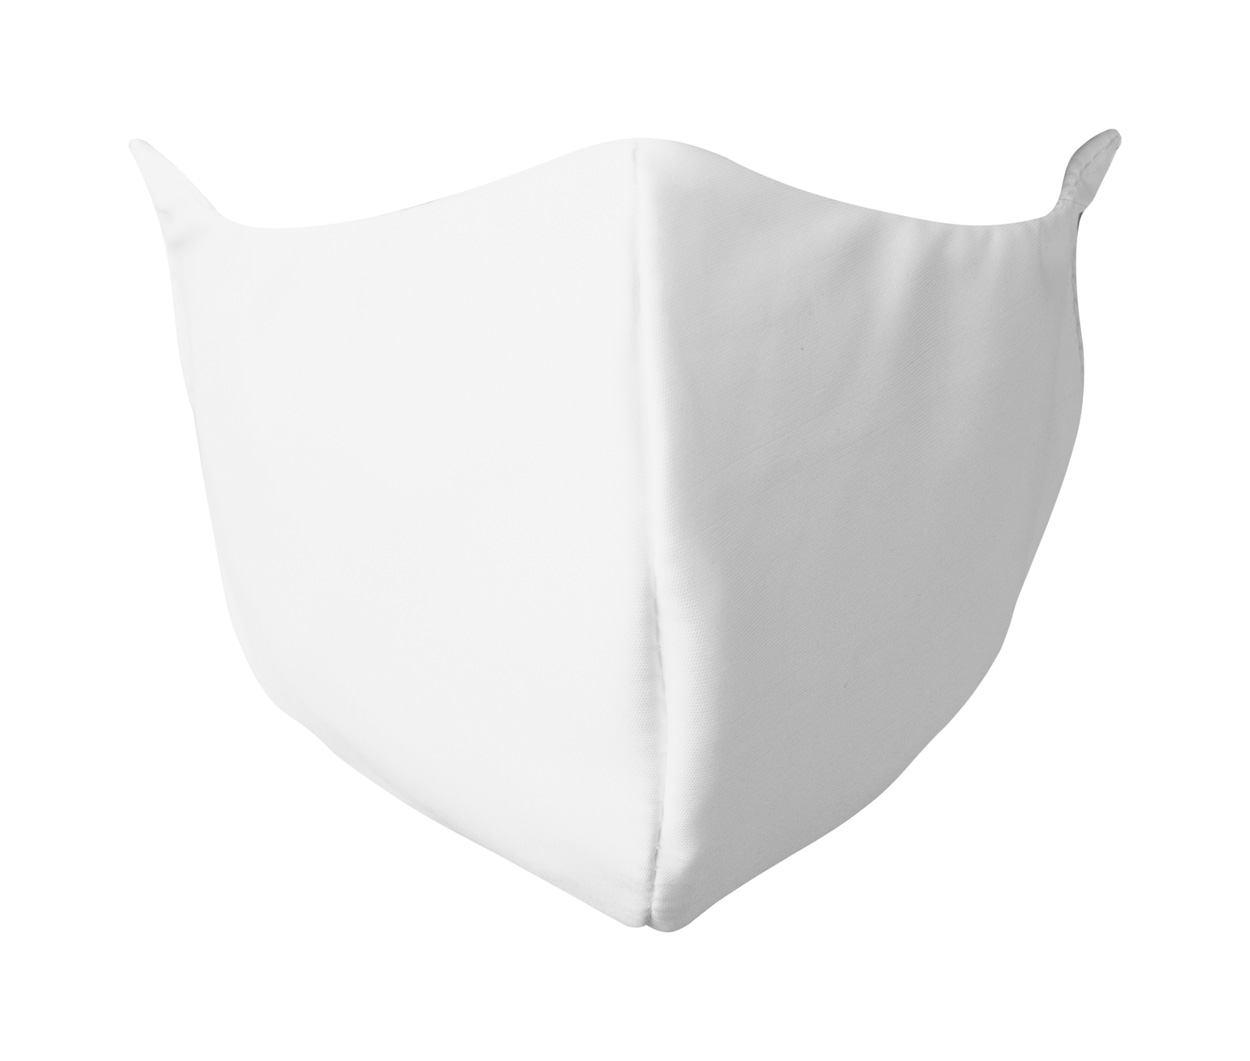 Masca custom sublimare 2 straturi bumbac poliester | Toroadv.ro